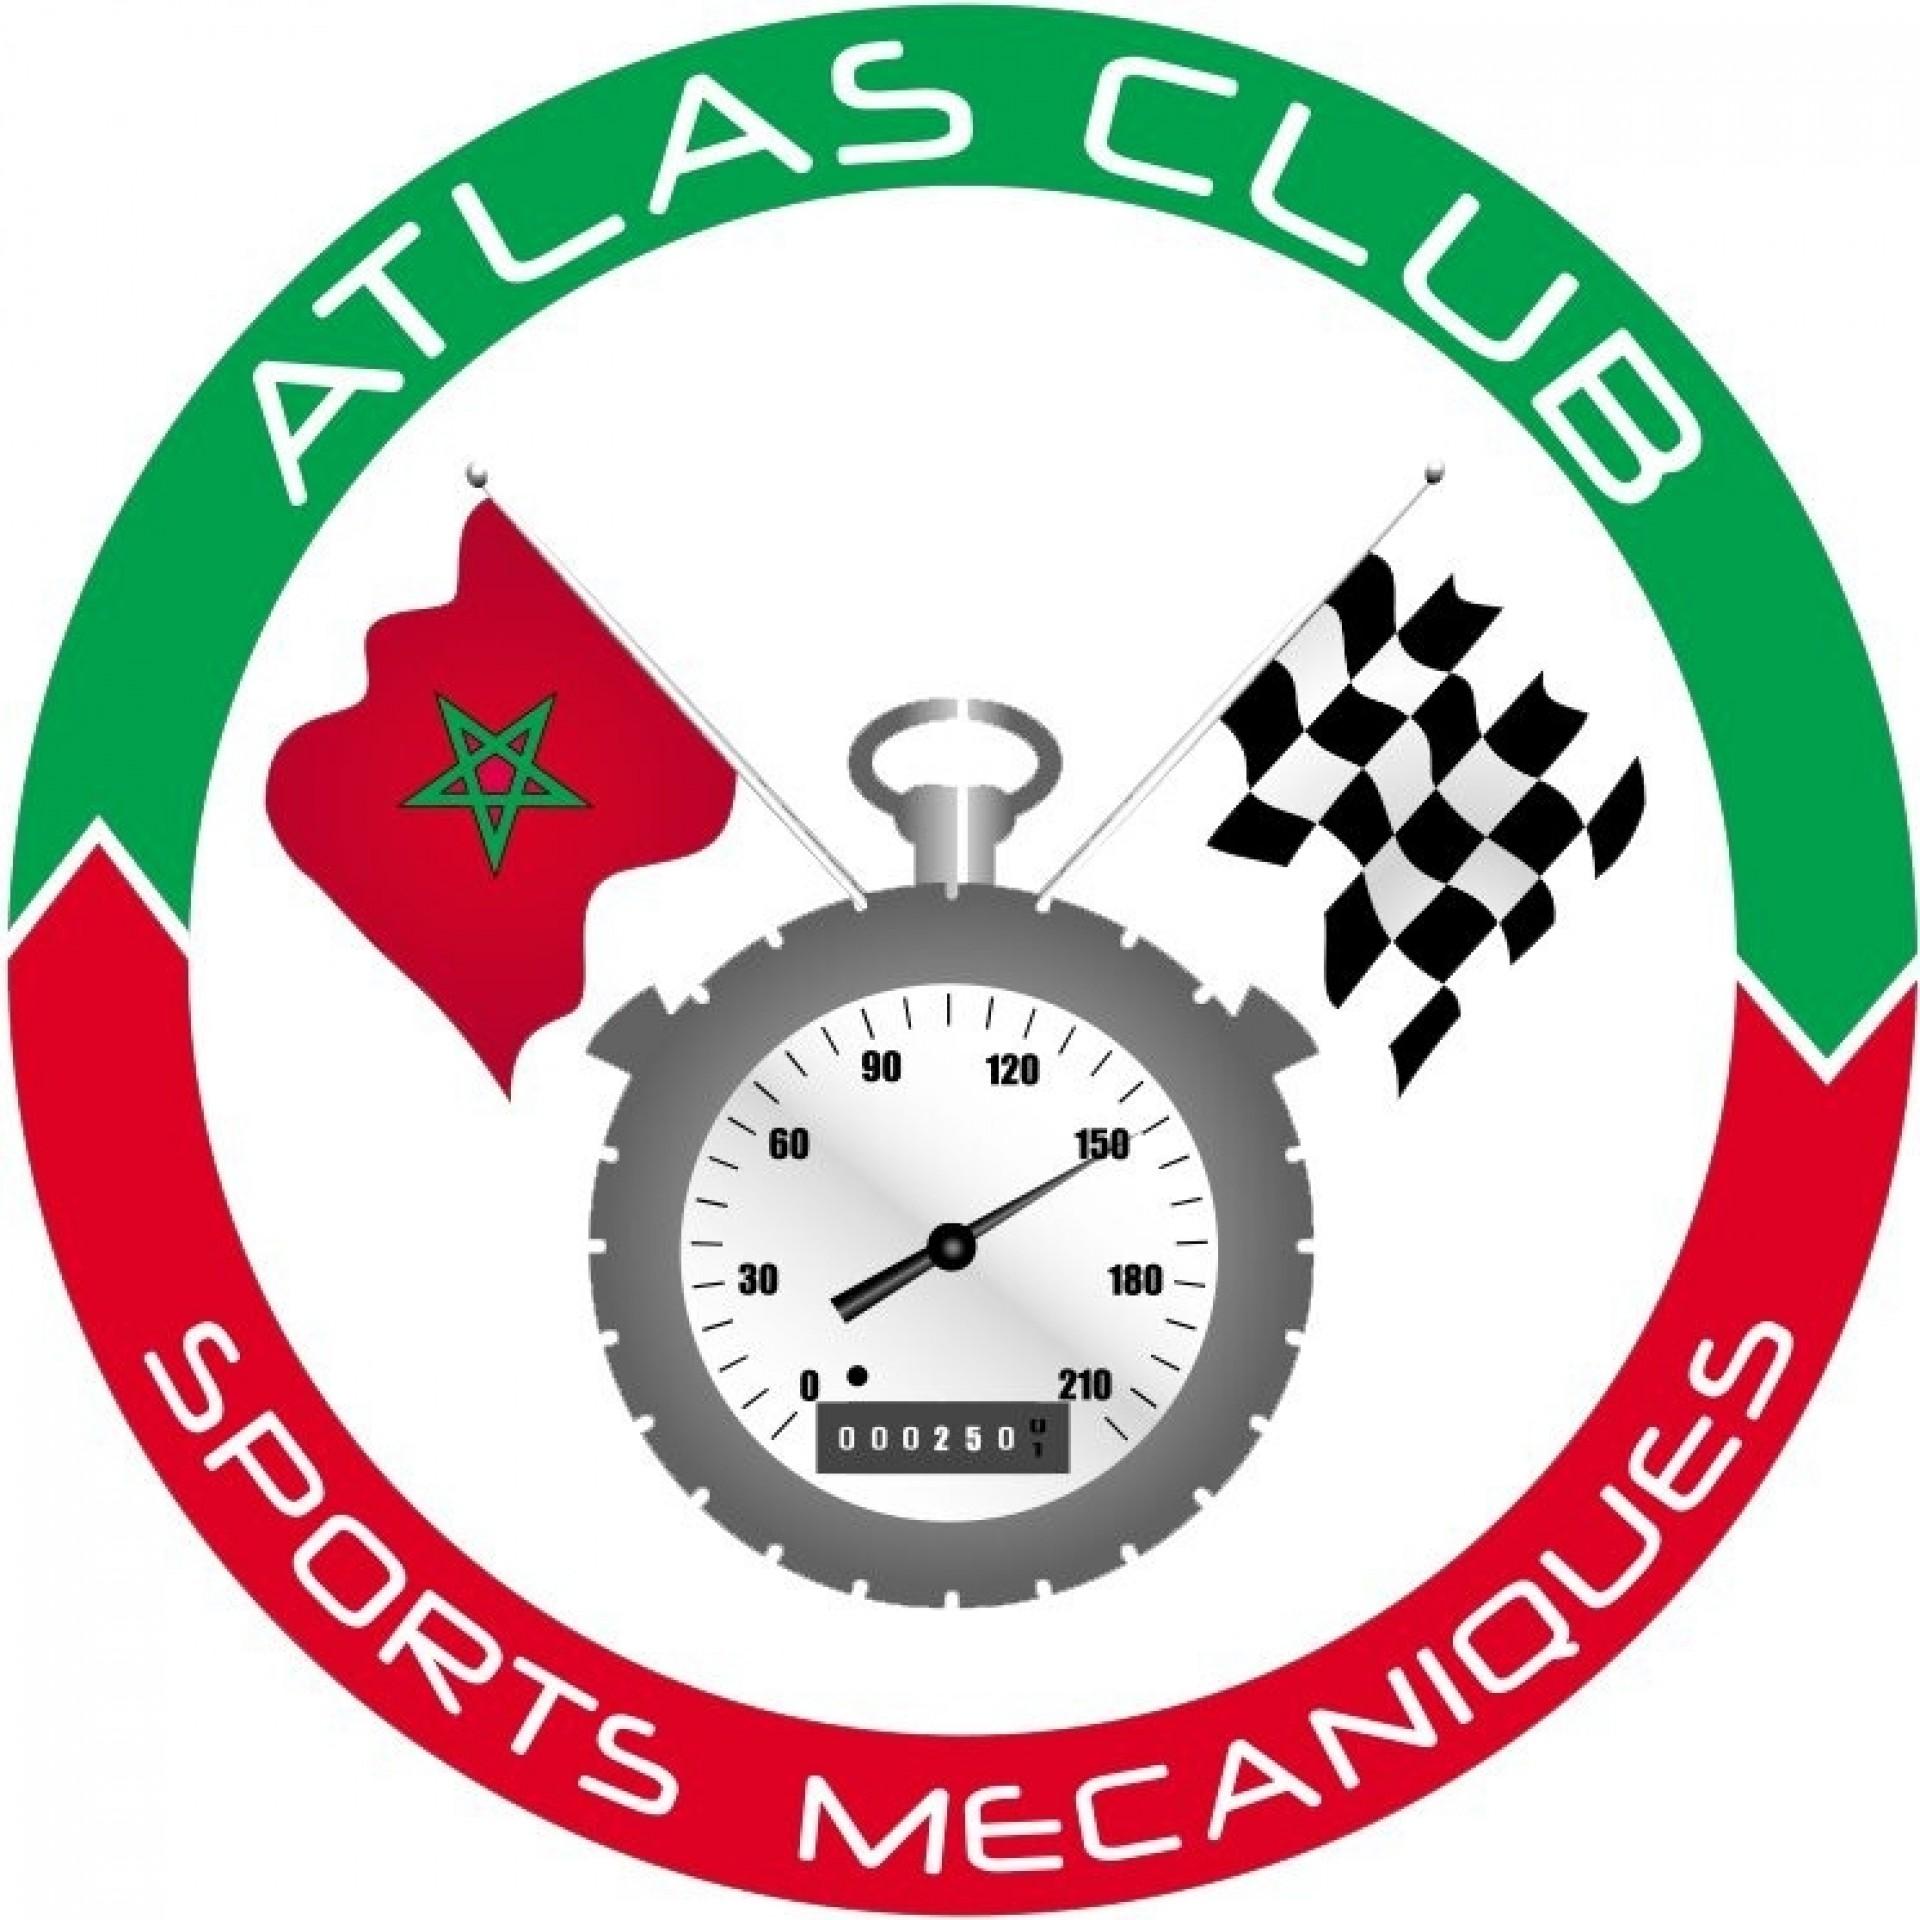 Atlas Club des Sports Mécaniques (ACSM)